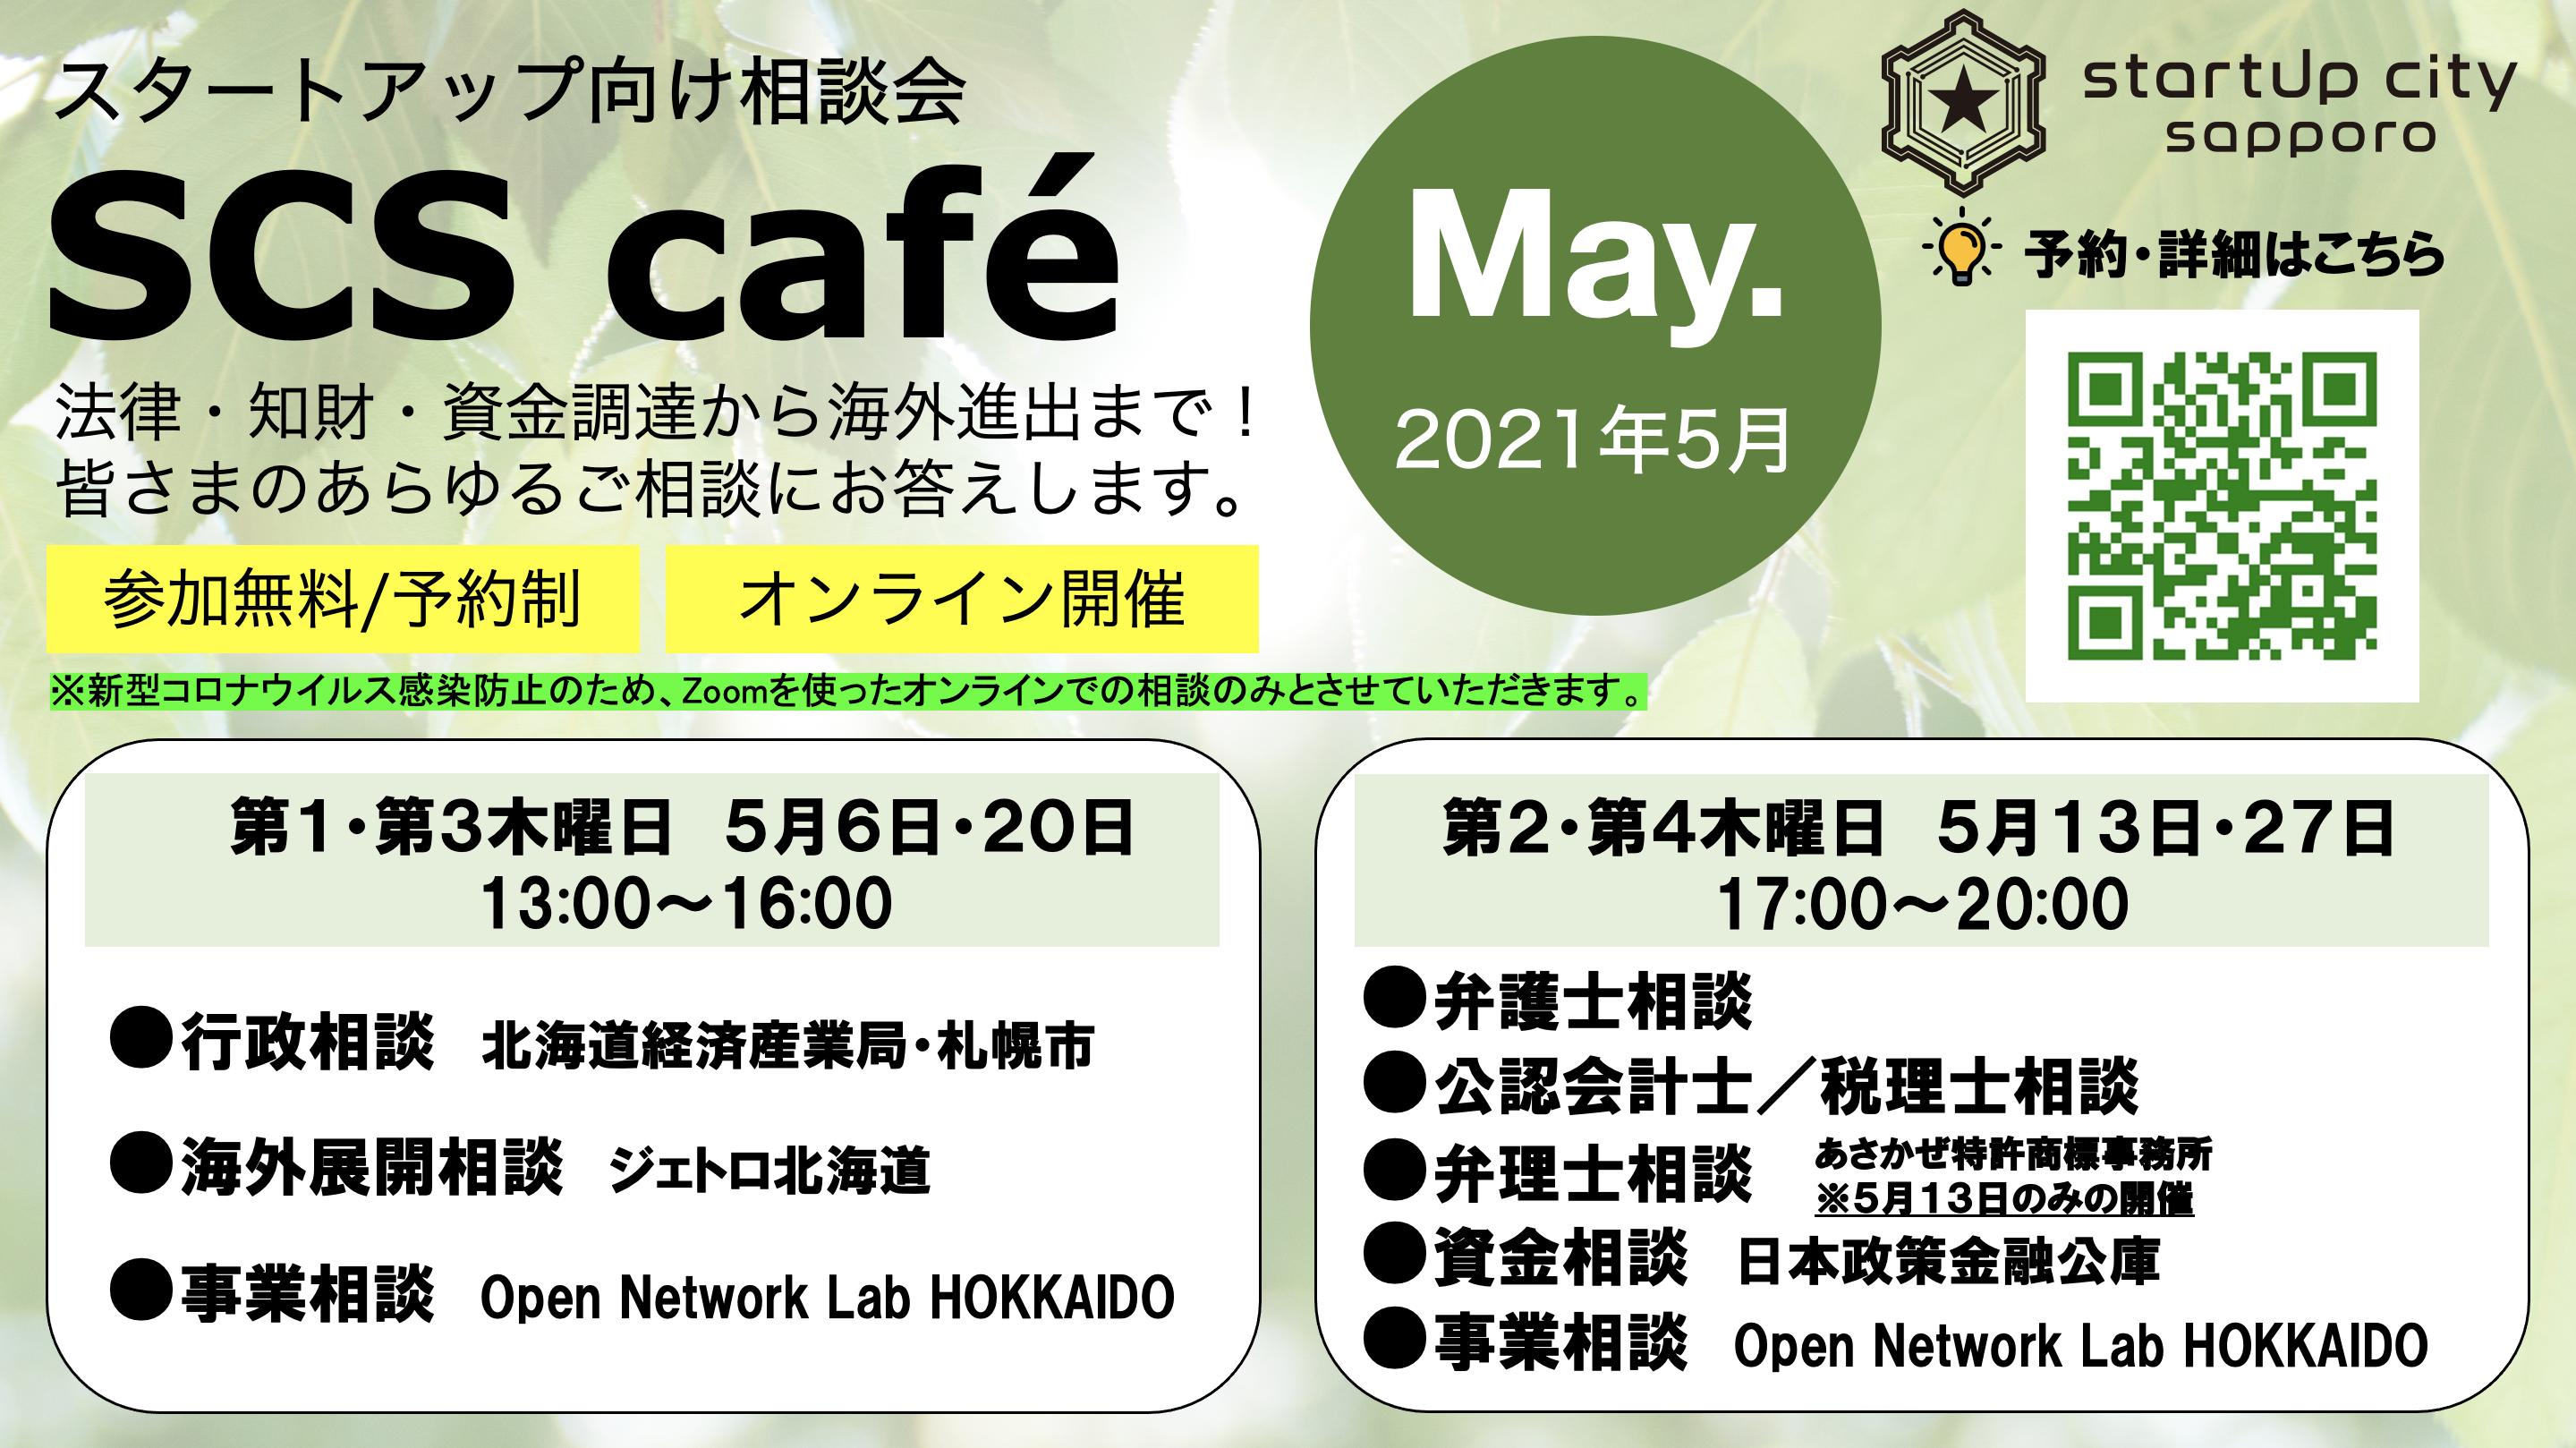 【STARTUP CITY SAPPORO café】5月スタートアップ向け相談会のご案内